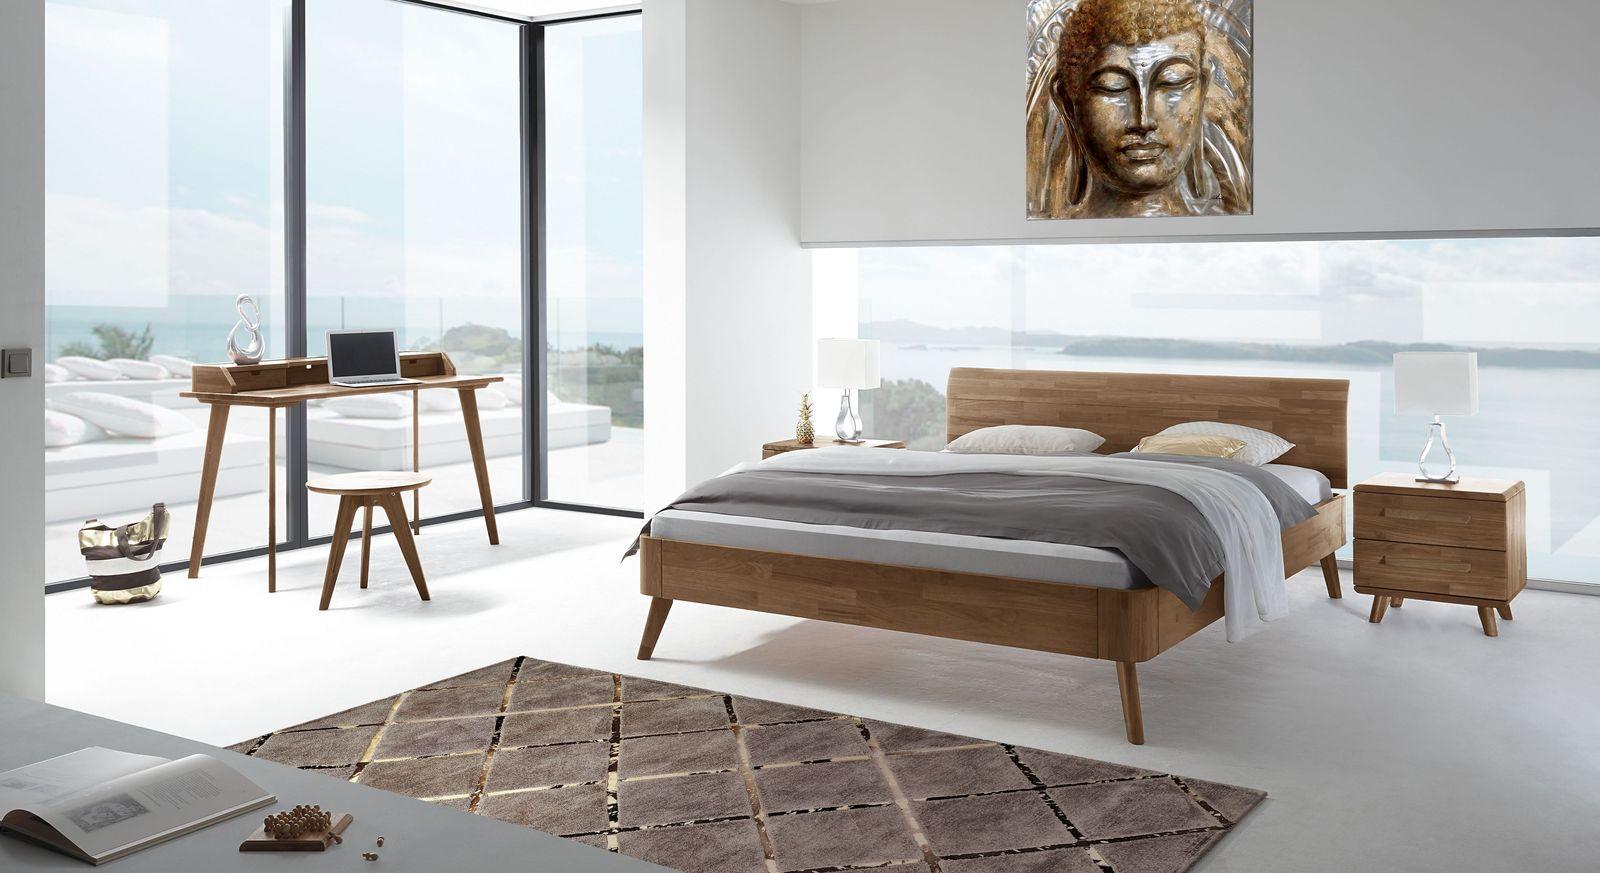 Passende Produkte zum Bett Parkano